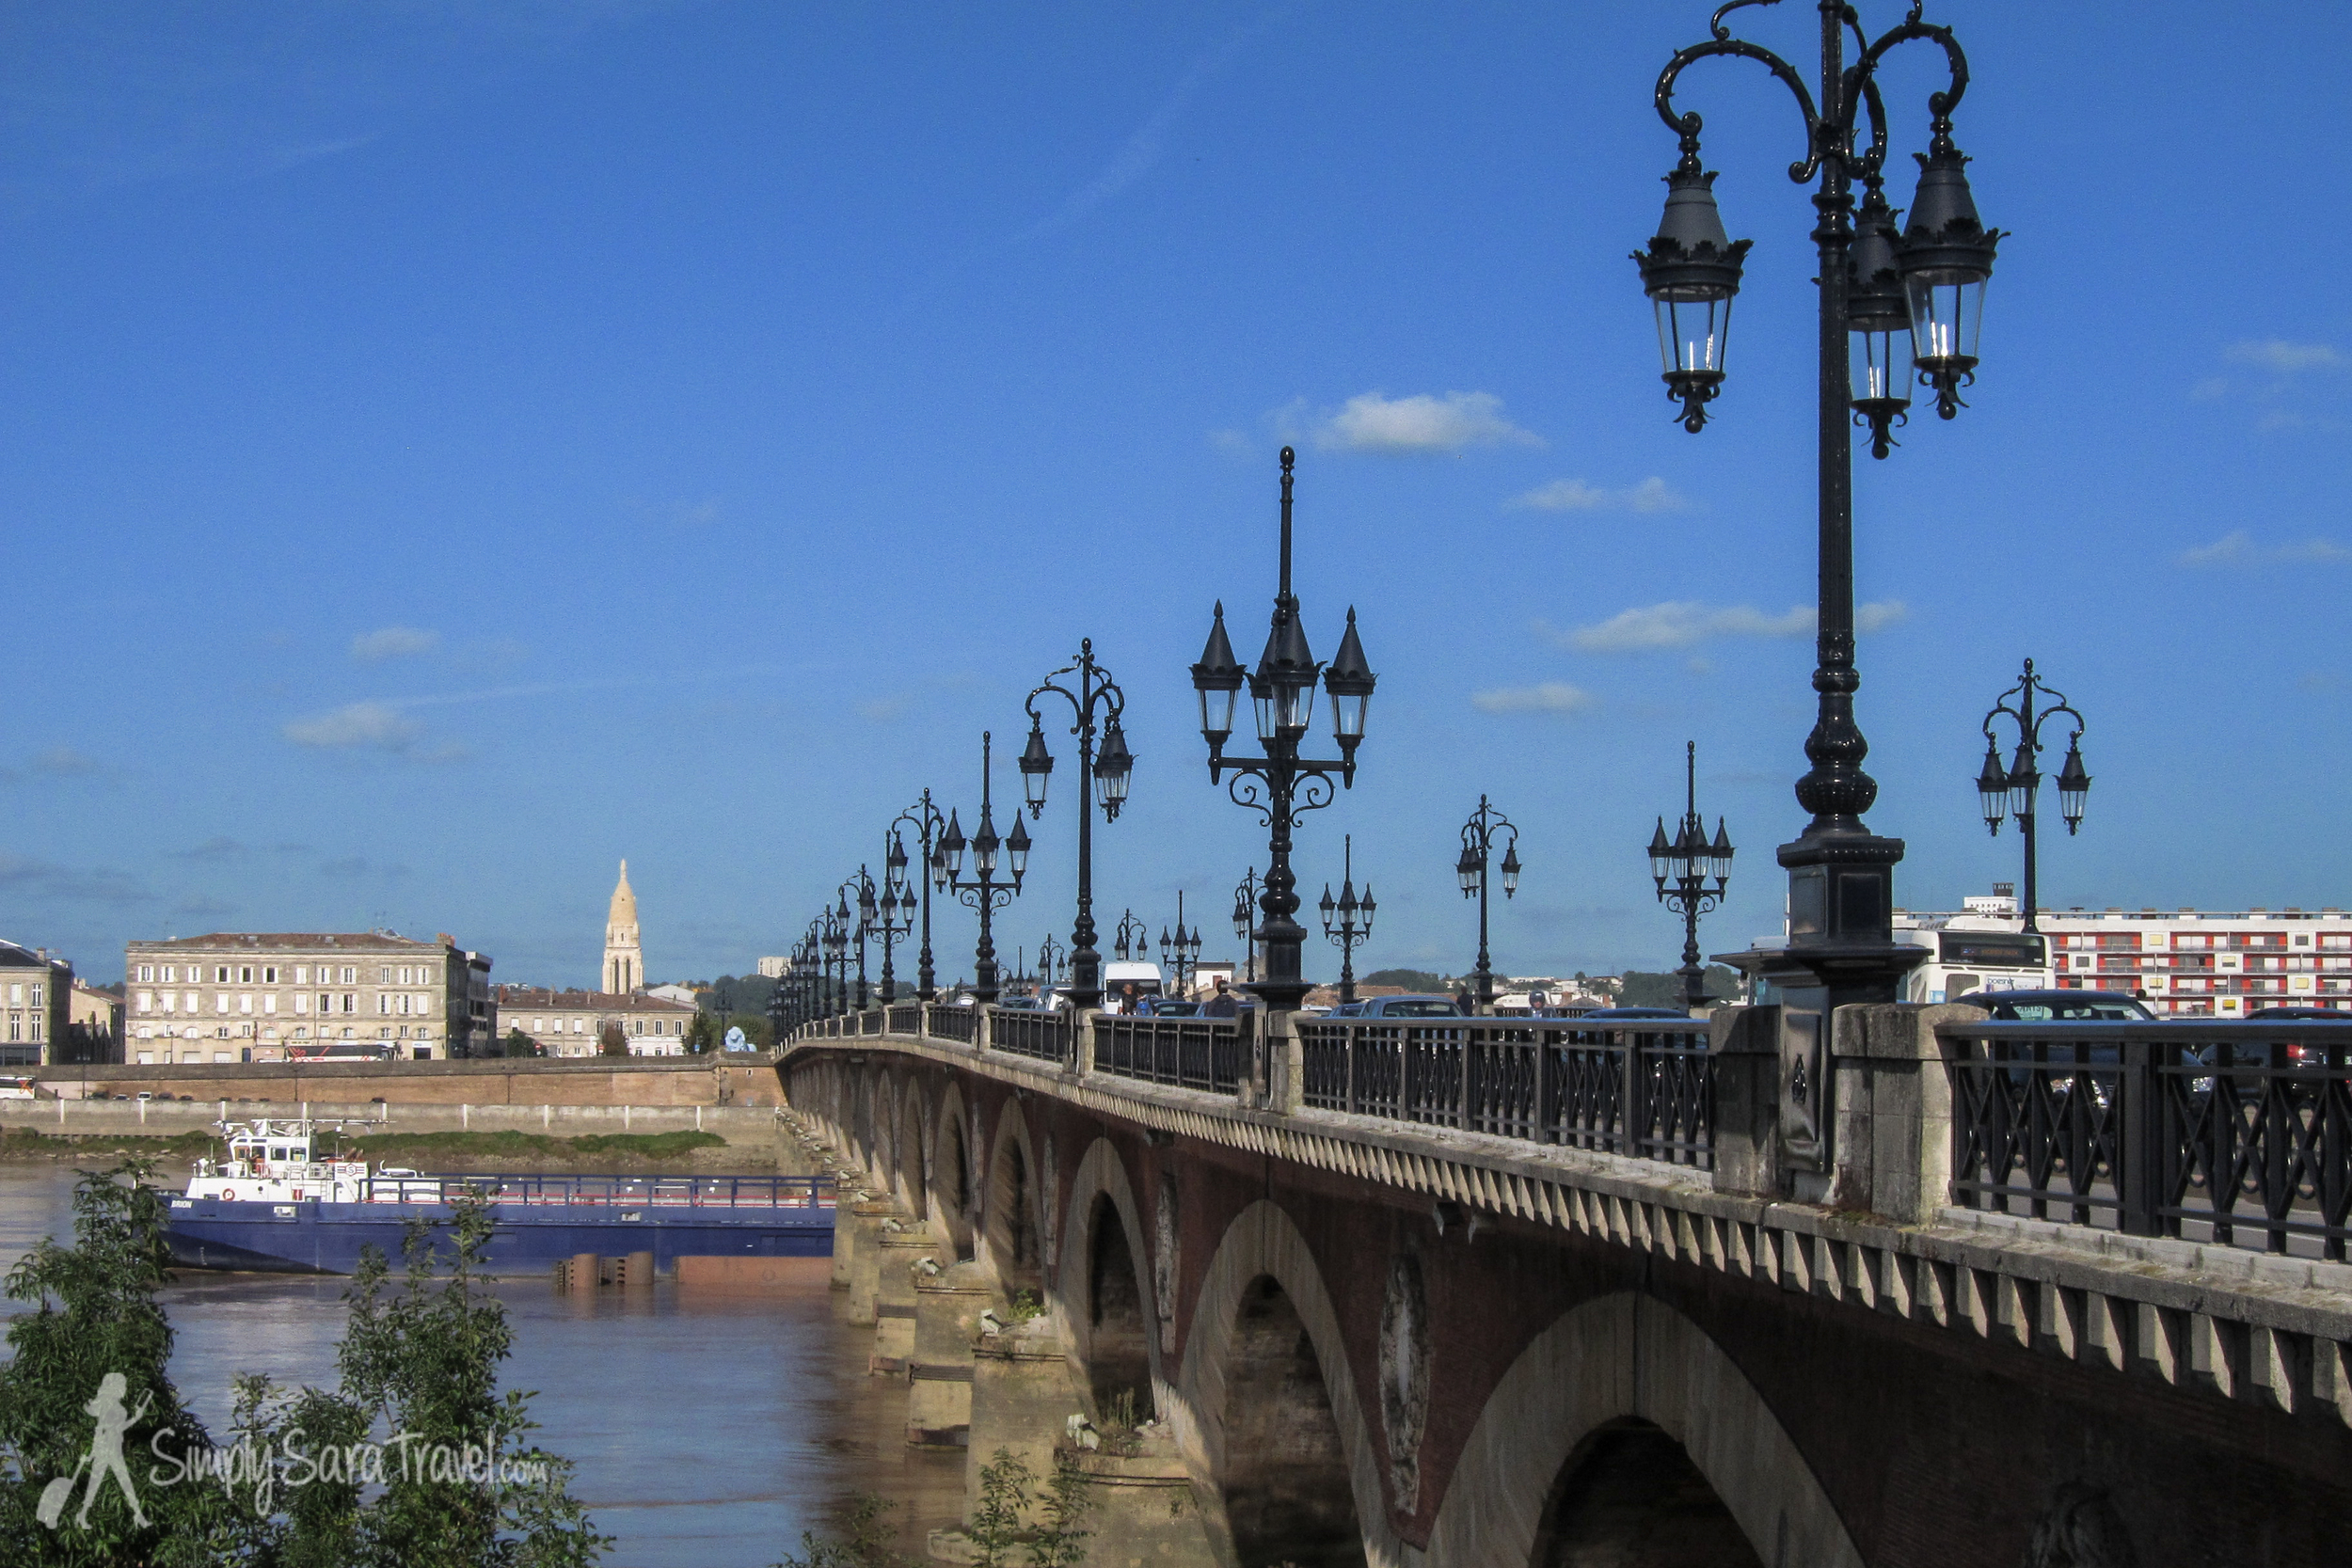 One of the memorable architectural features of Bordeaux, the Pont de Pierre